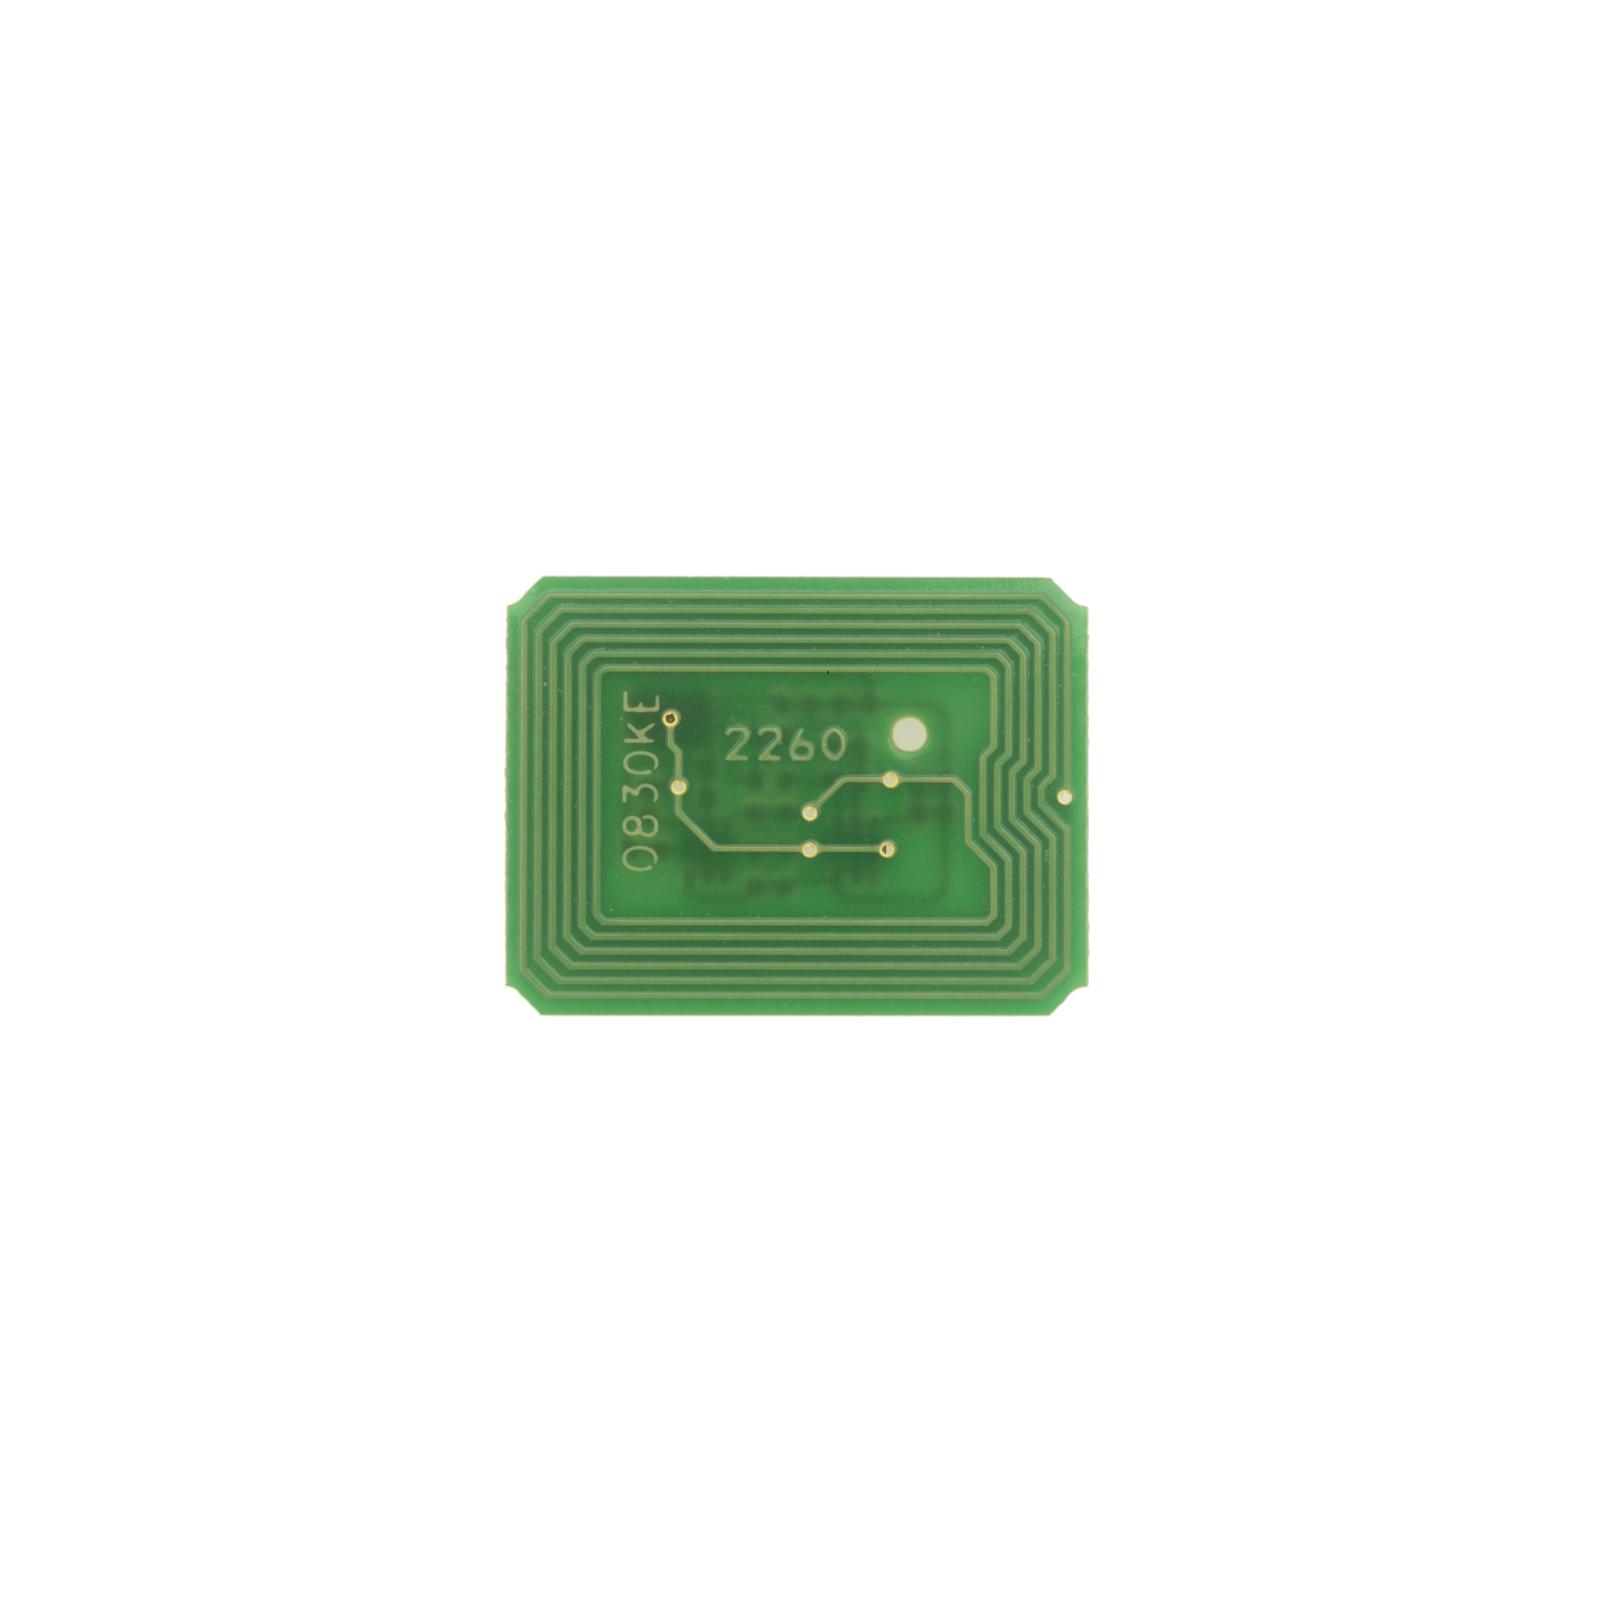 Чип для картриджа Oki C910 (44036023) 15k сyan Static Control (OKI910CHIP-CEU)